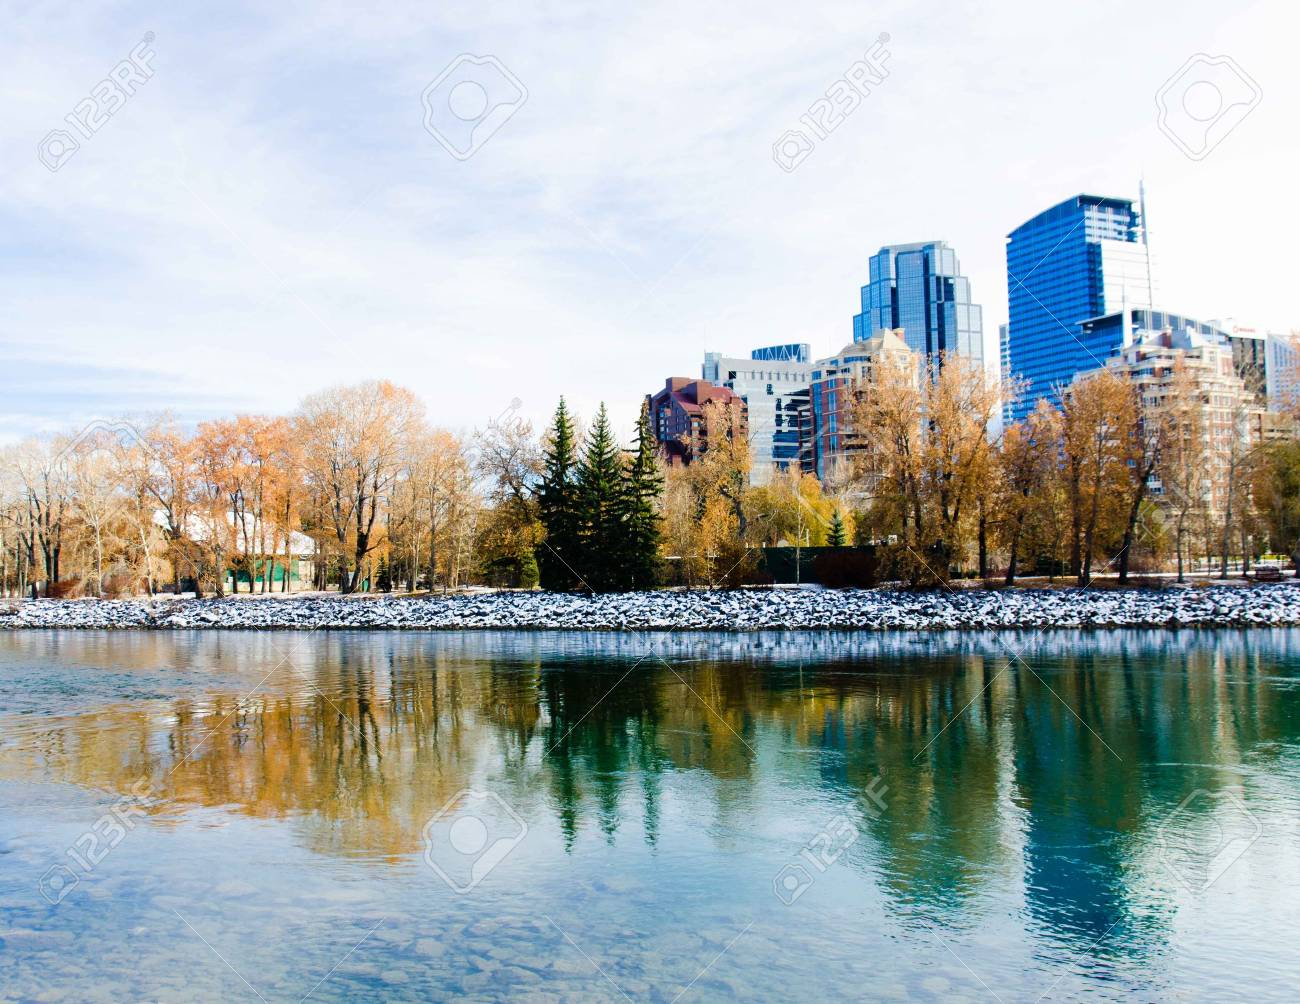 Prince s Island Park, Calgary, Canada Stock Photo - 16720624